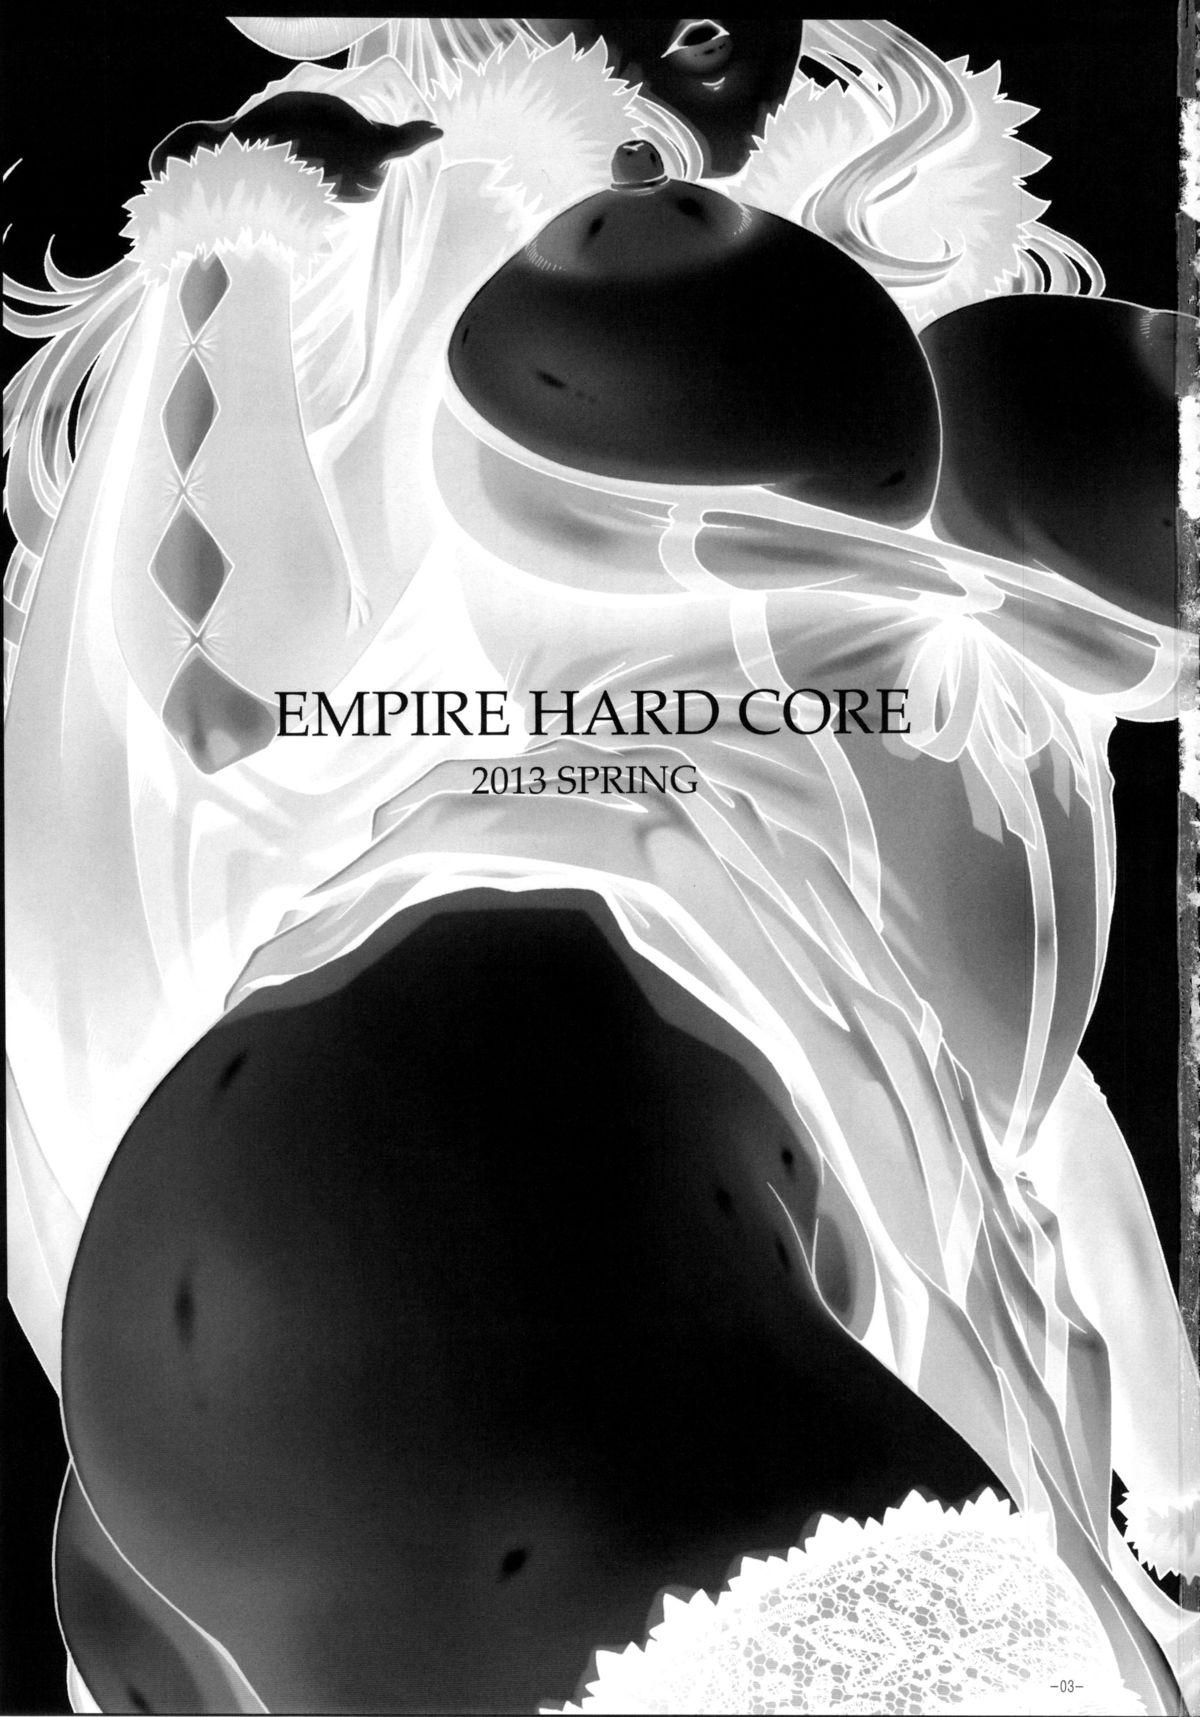 EMPIRE HARD CORE 2013 SPRING 1